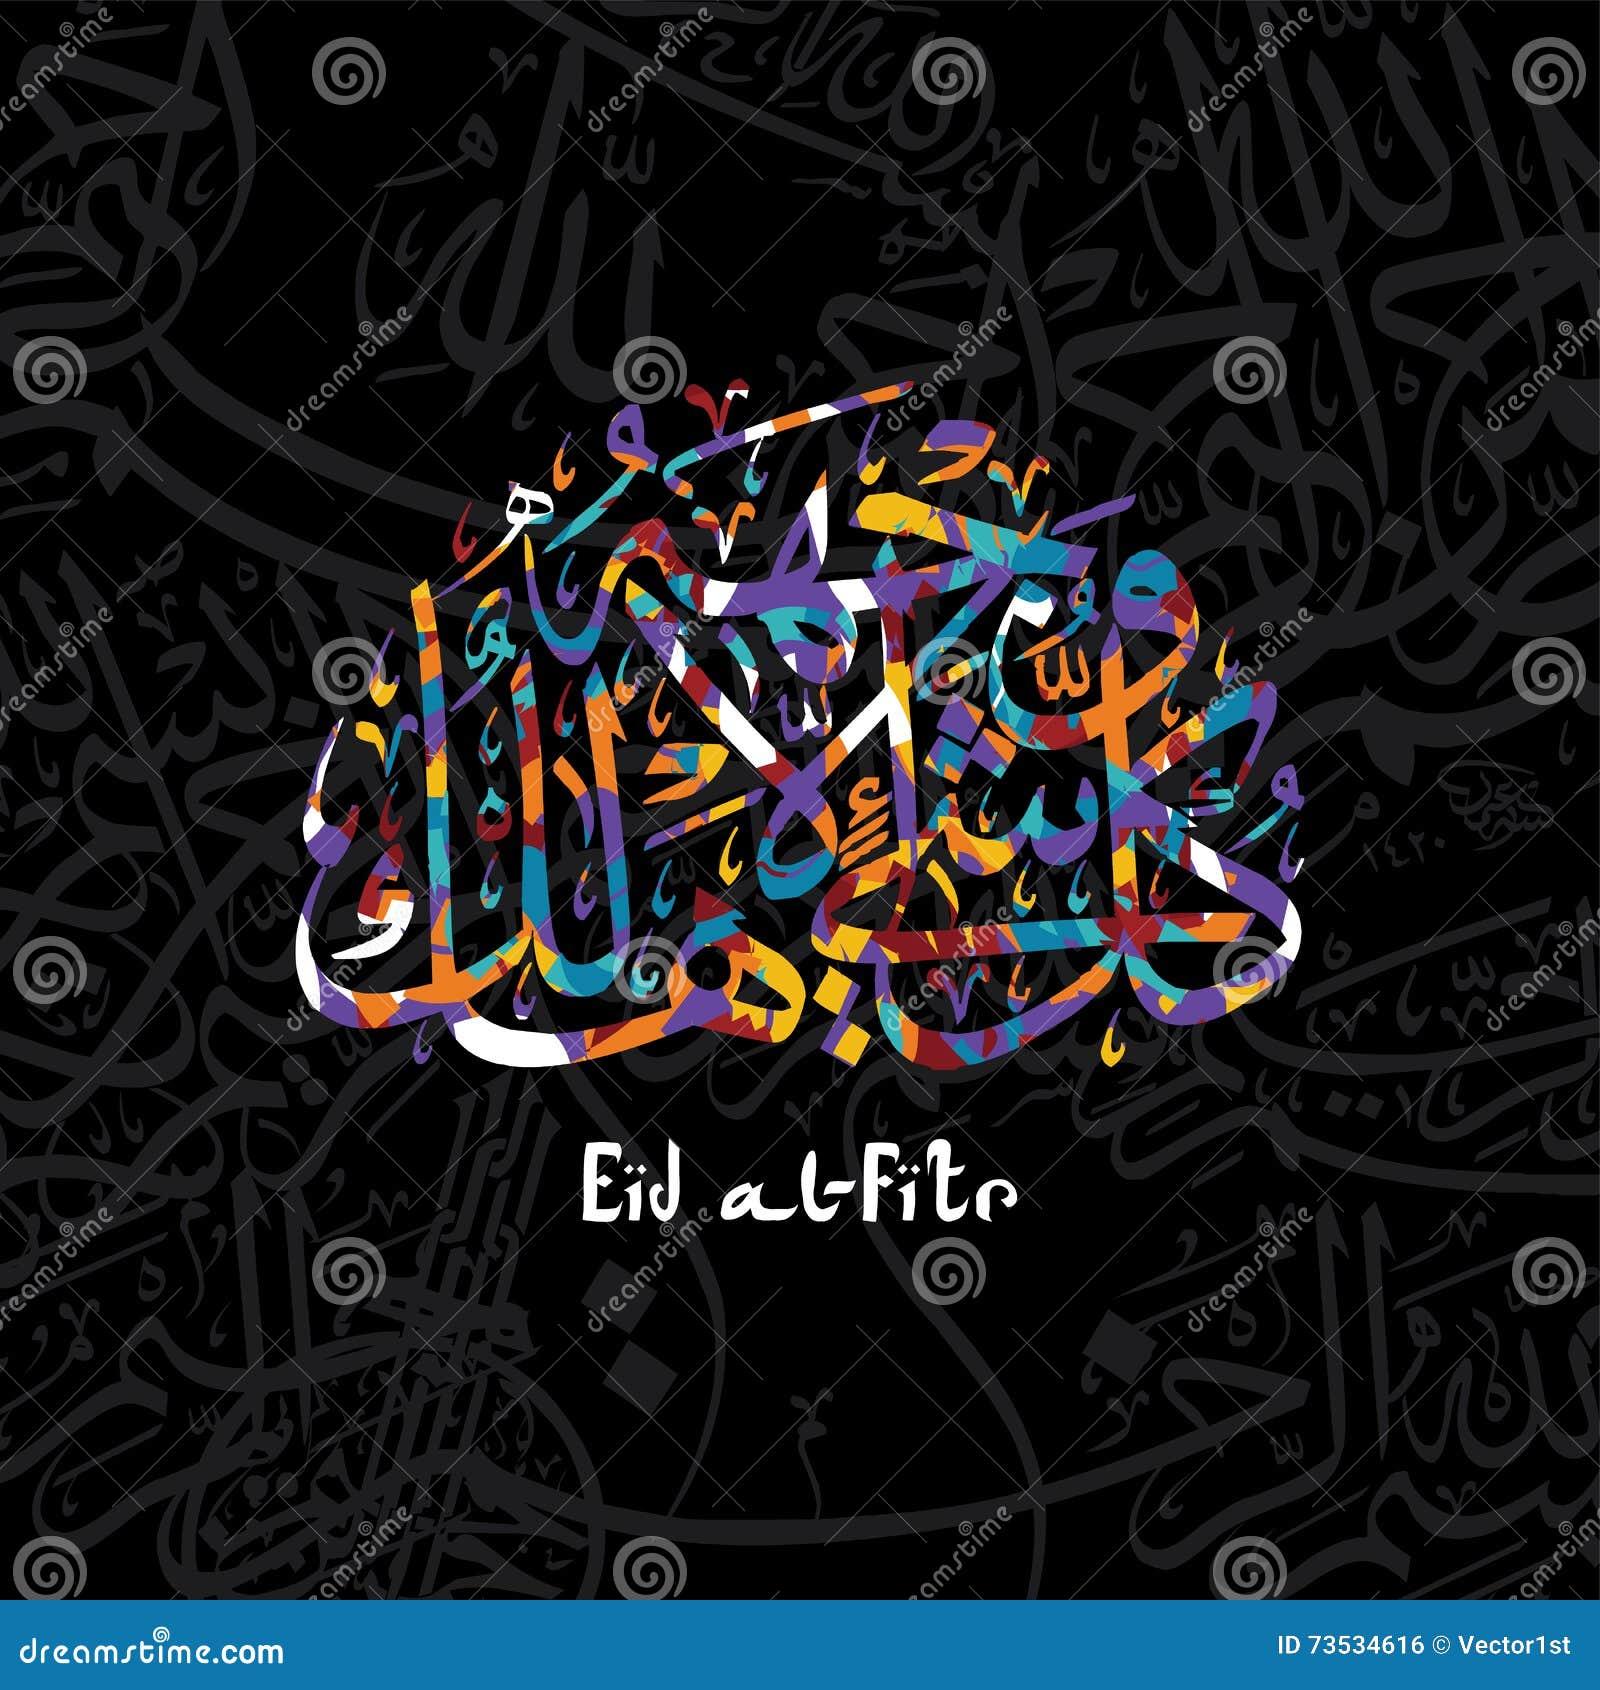 Happy Eid Mubarak Greetings Arabic Calligraphy Art Stock Vector